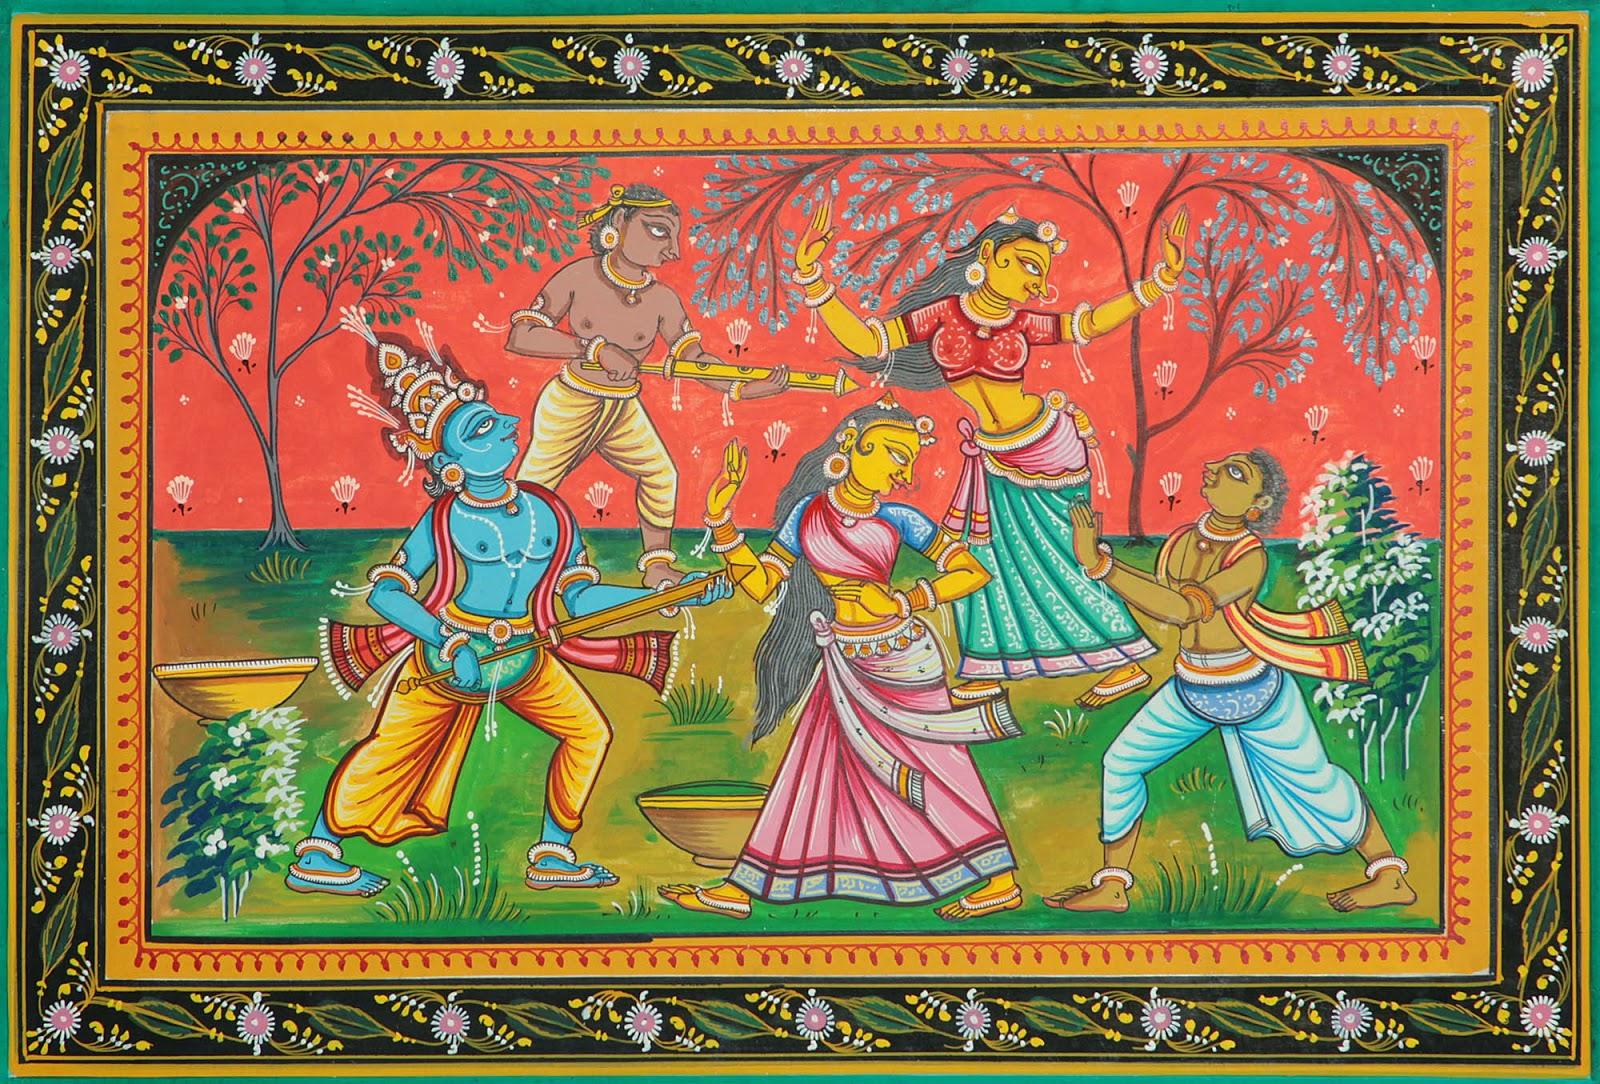 Radha-Krishna image playing Holi the festival of colors.